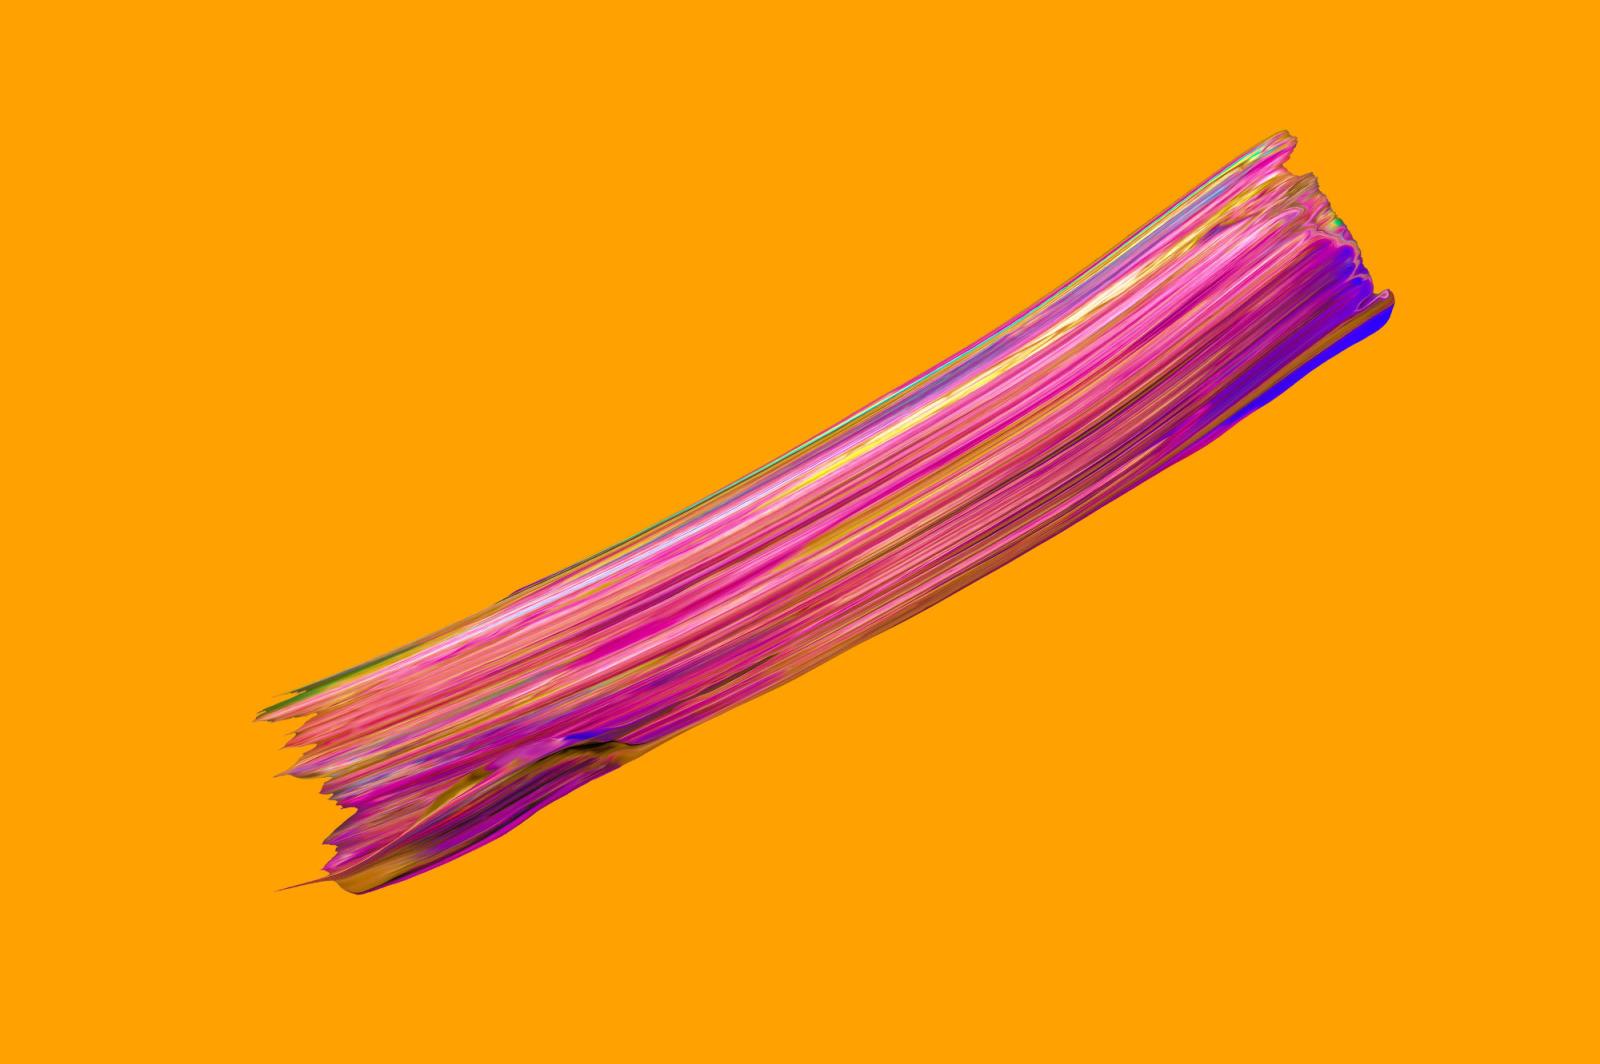 Vibrant Paint Strokes, Vol. 2